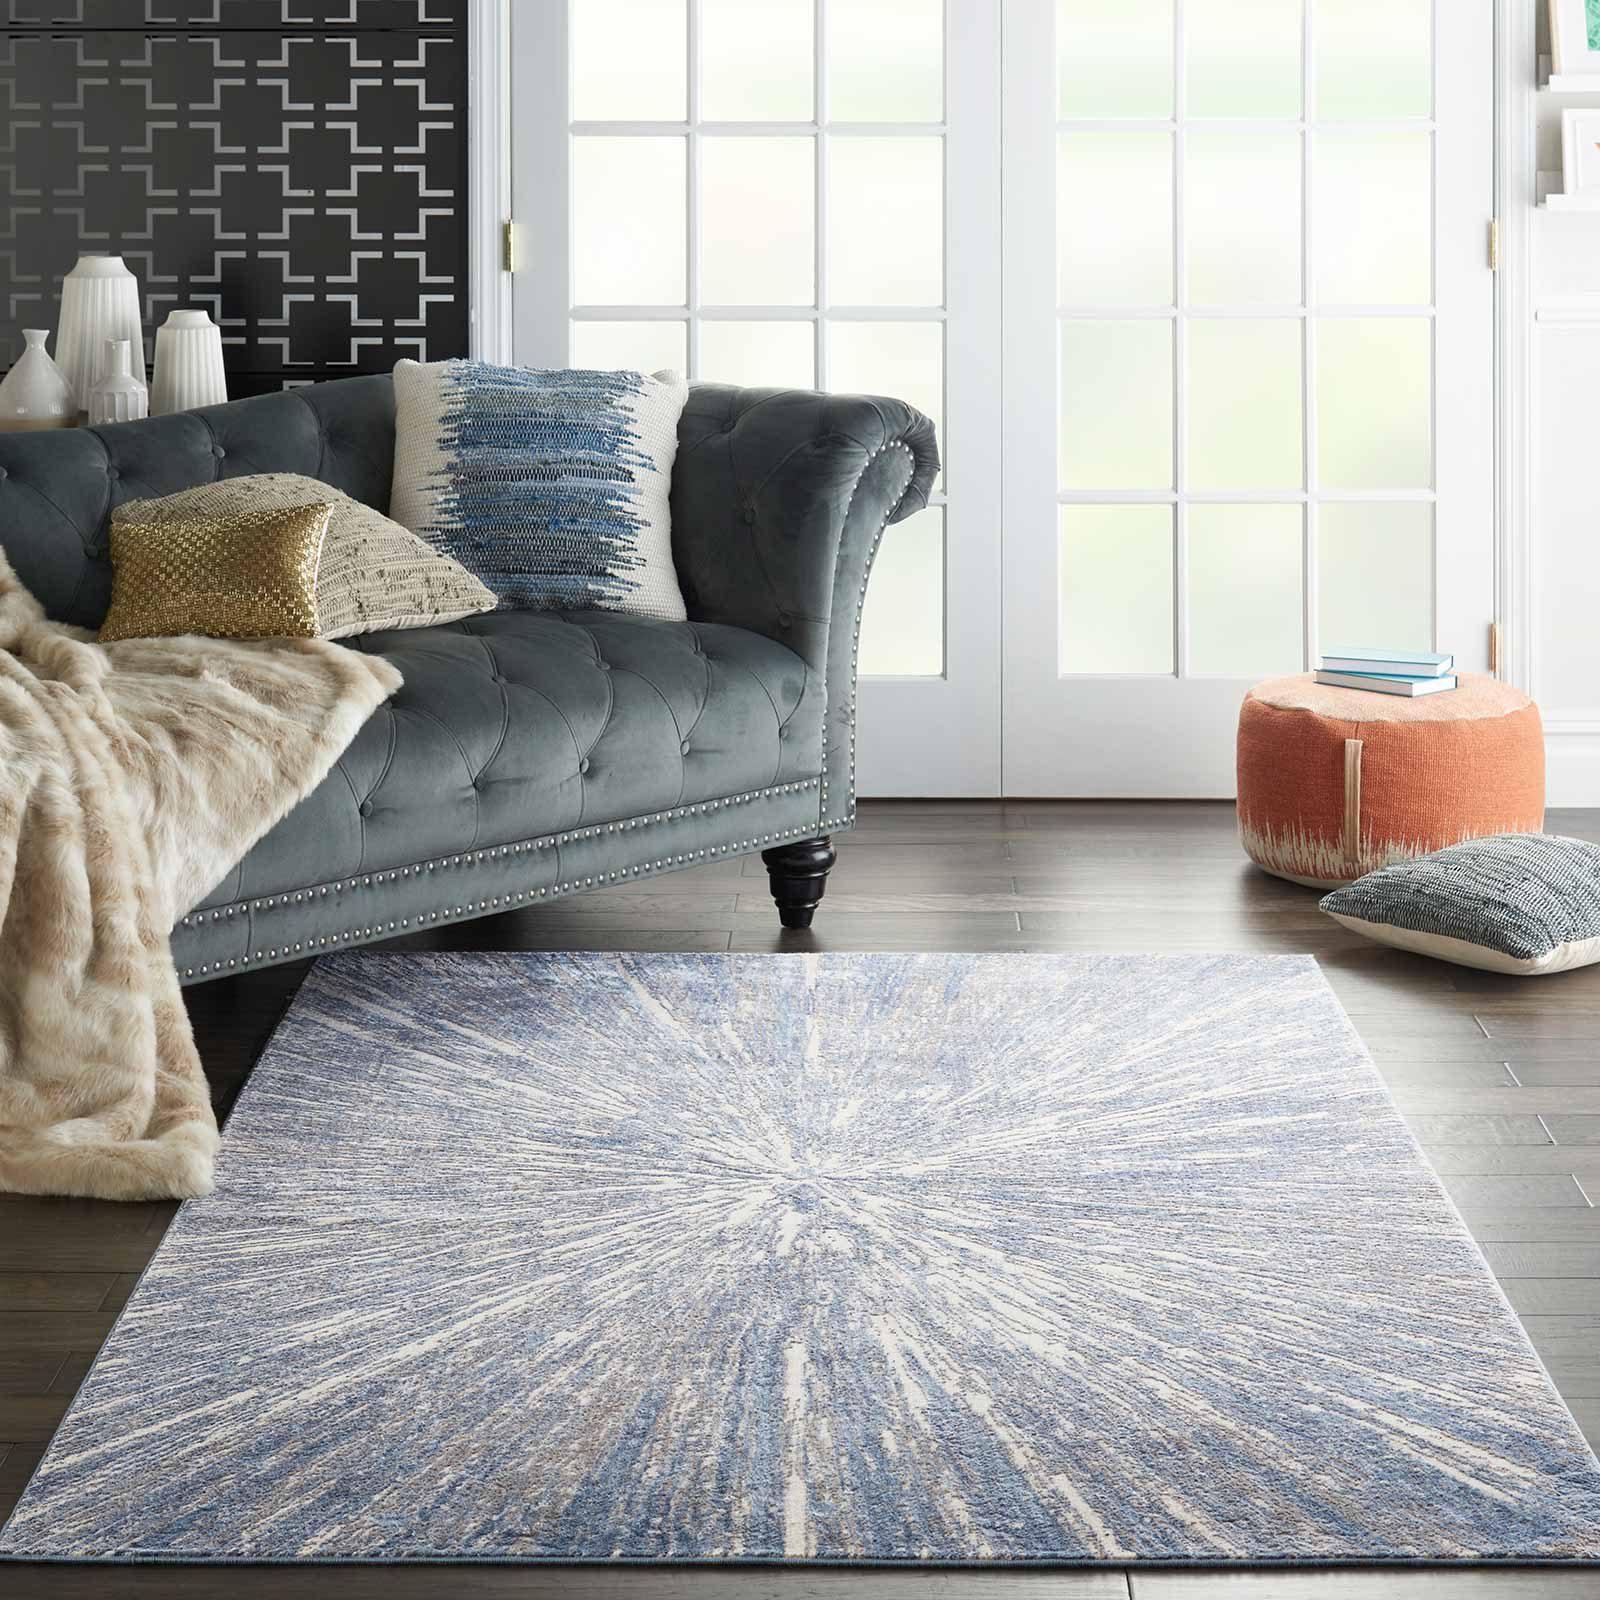 Nourison rug Silky Textures SLY05 BLUE GREY 5x7 099446710222 interior 1 C